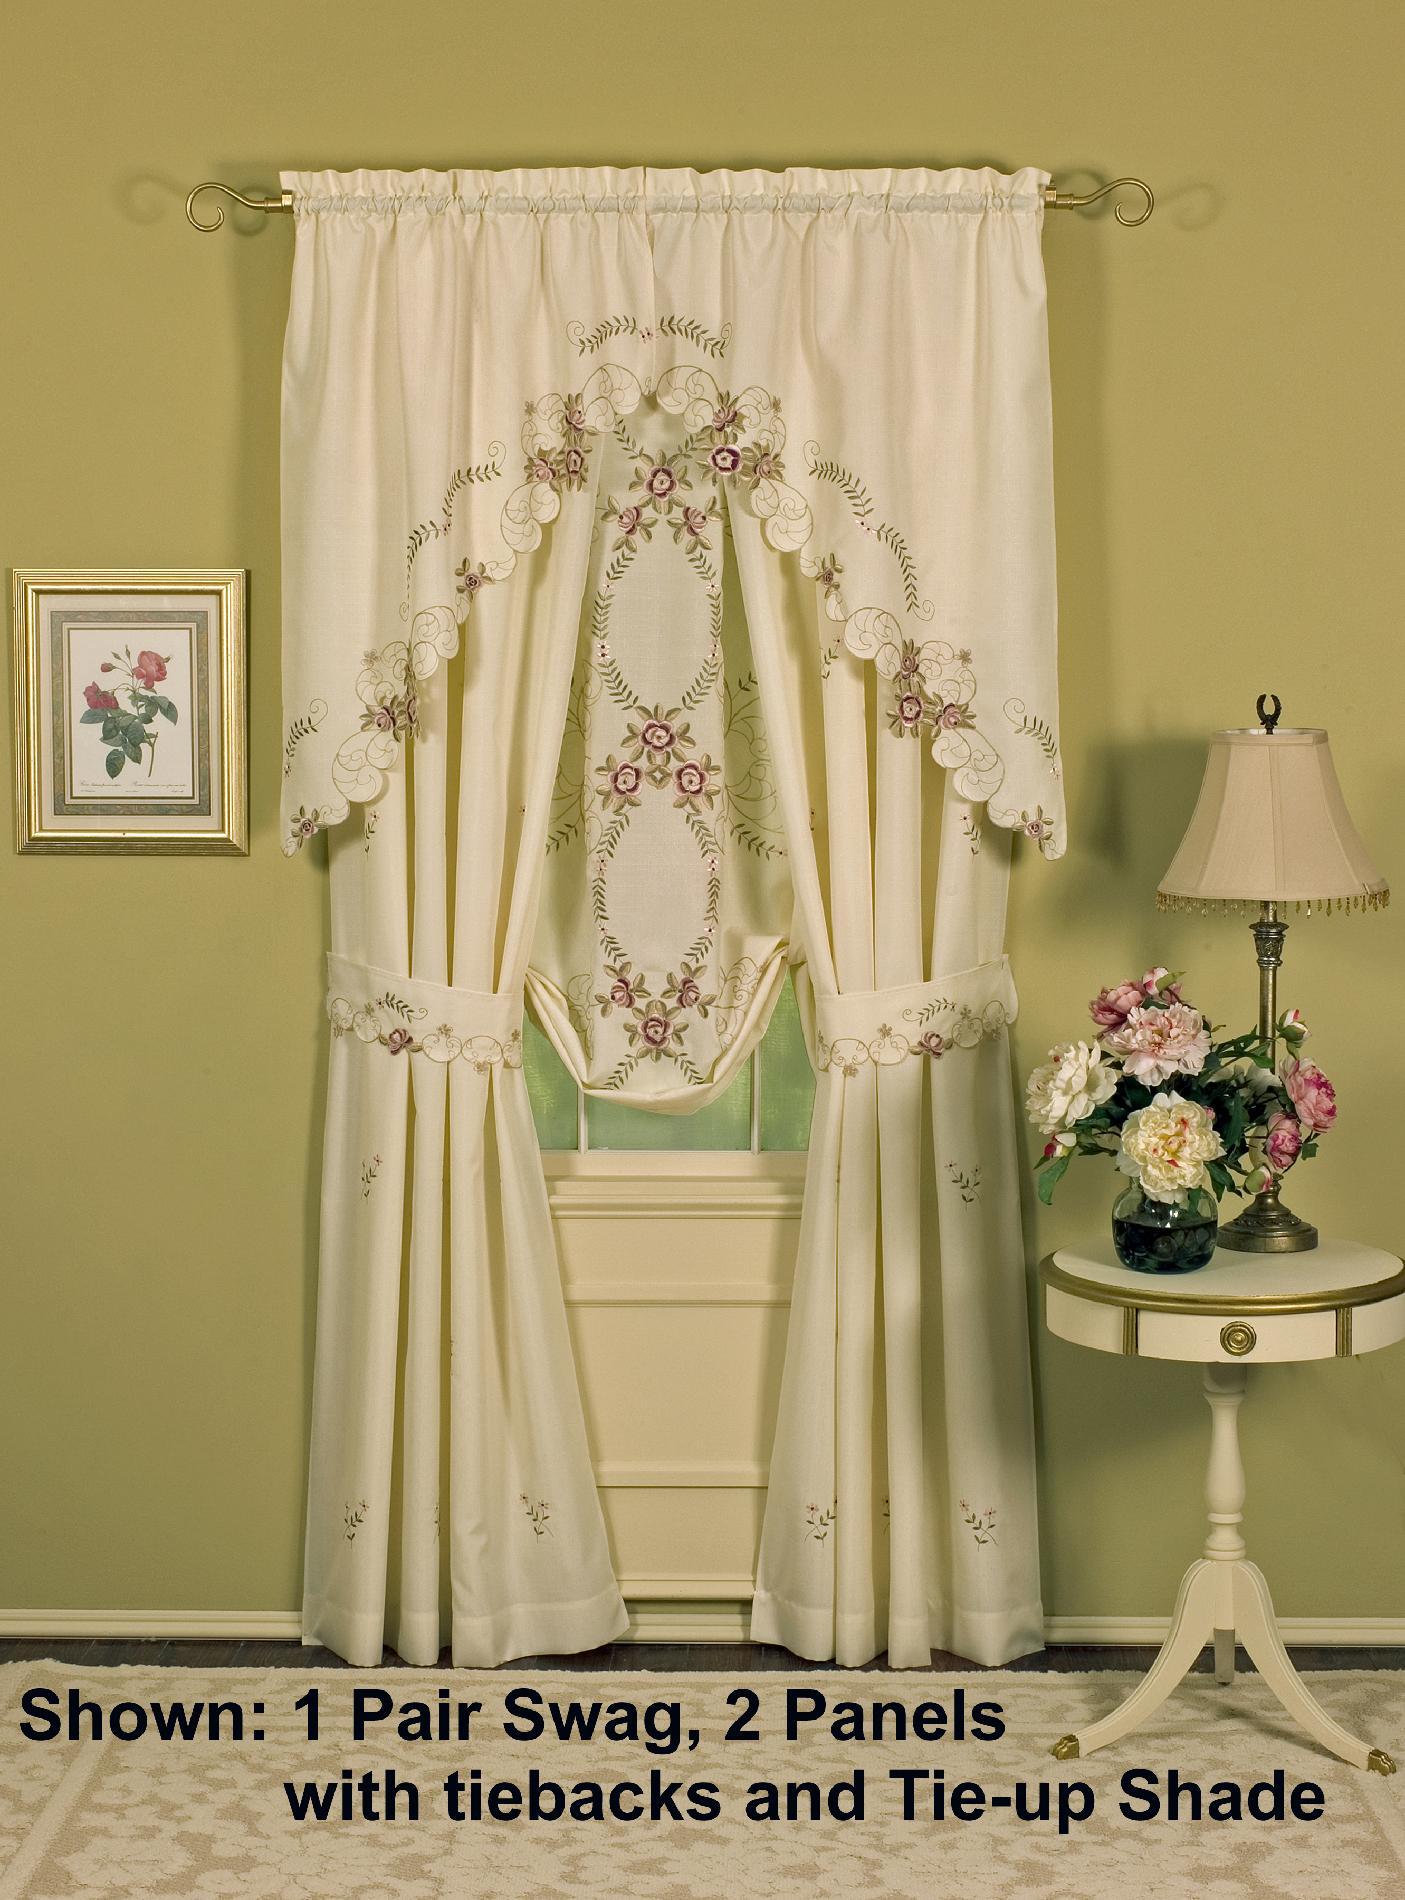 Today S Curtain Verona 38 Swag Pair Sears Curtains Diy Home Decor Decor #sears #curtains #for #living #room